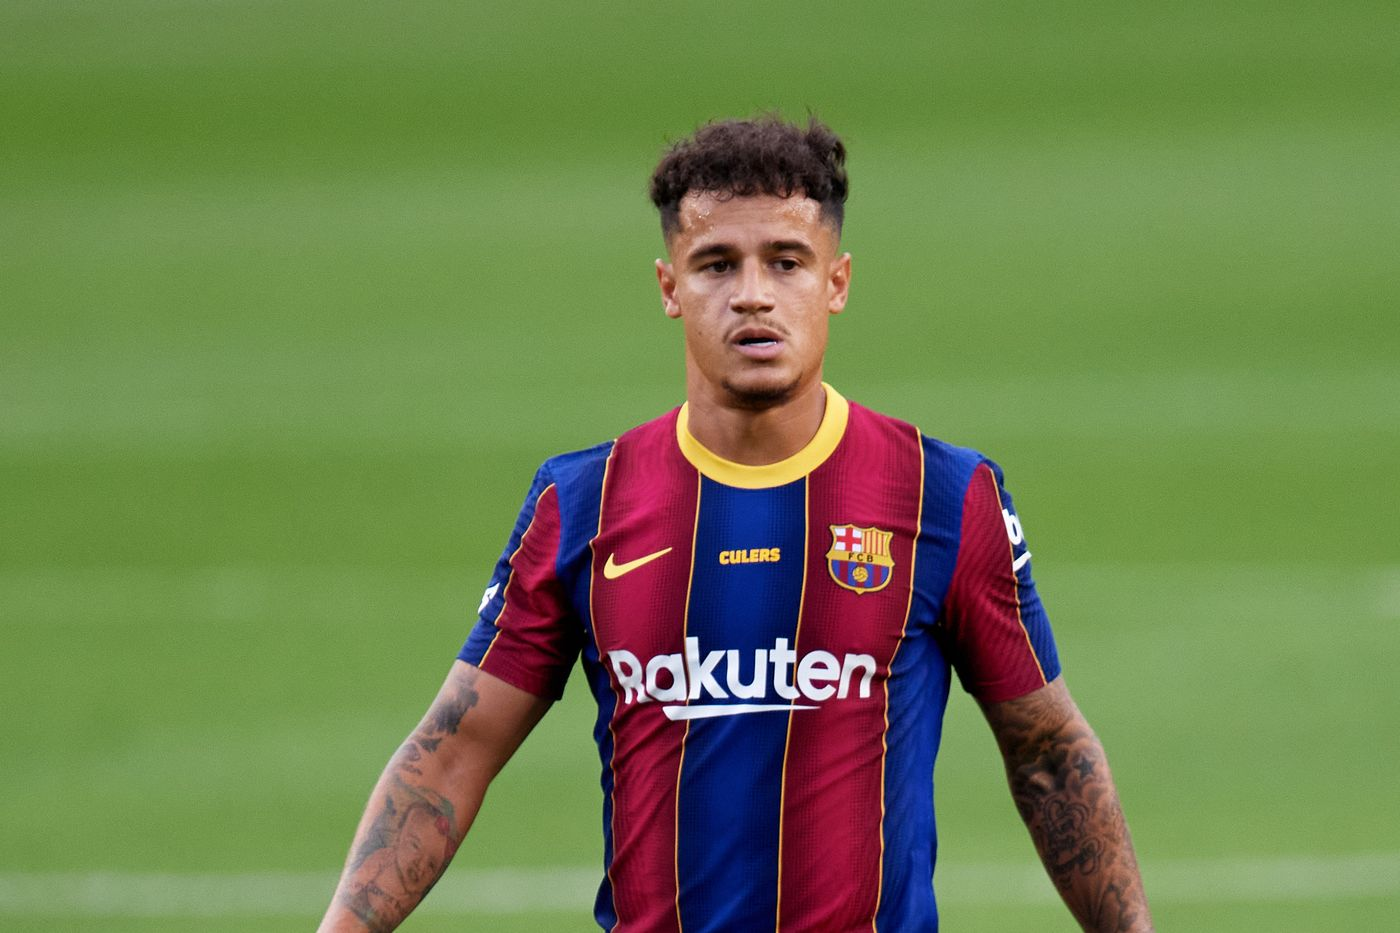 Coutinho Lacks Self-Belief To Shine At Barca -Johnson